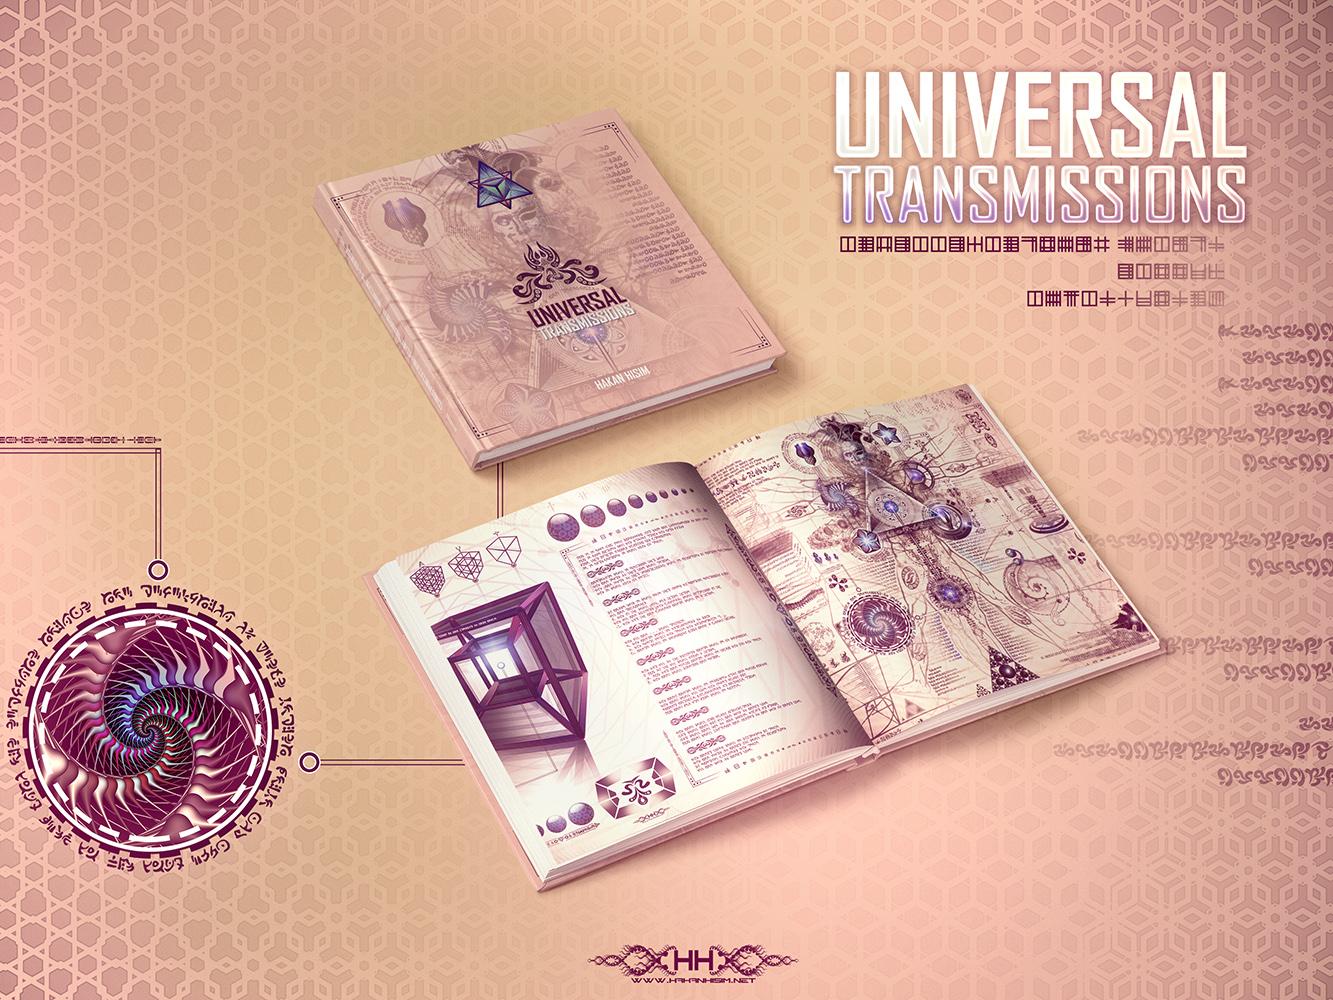 UNIVERSAL TRANSMISSIONS MOCKUP 2.jpg